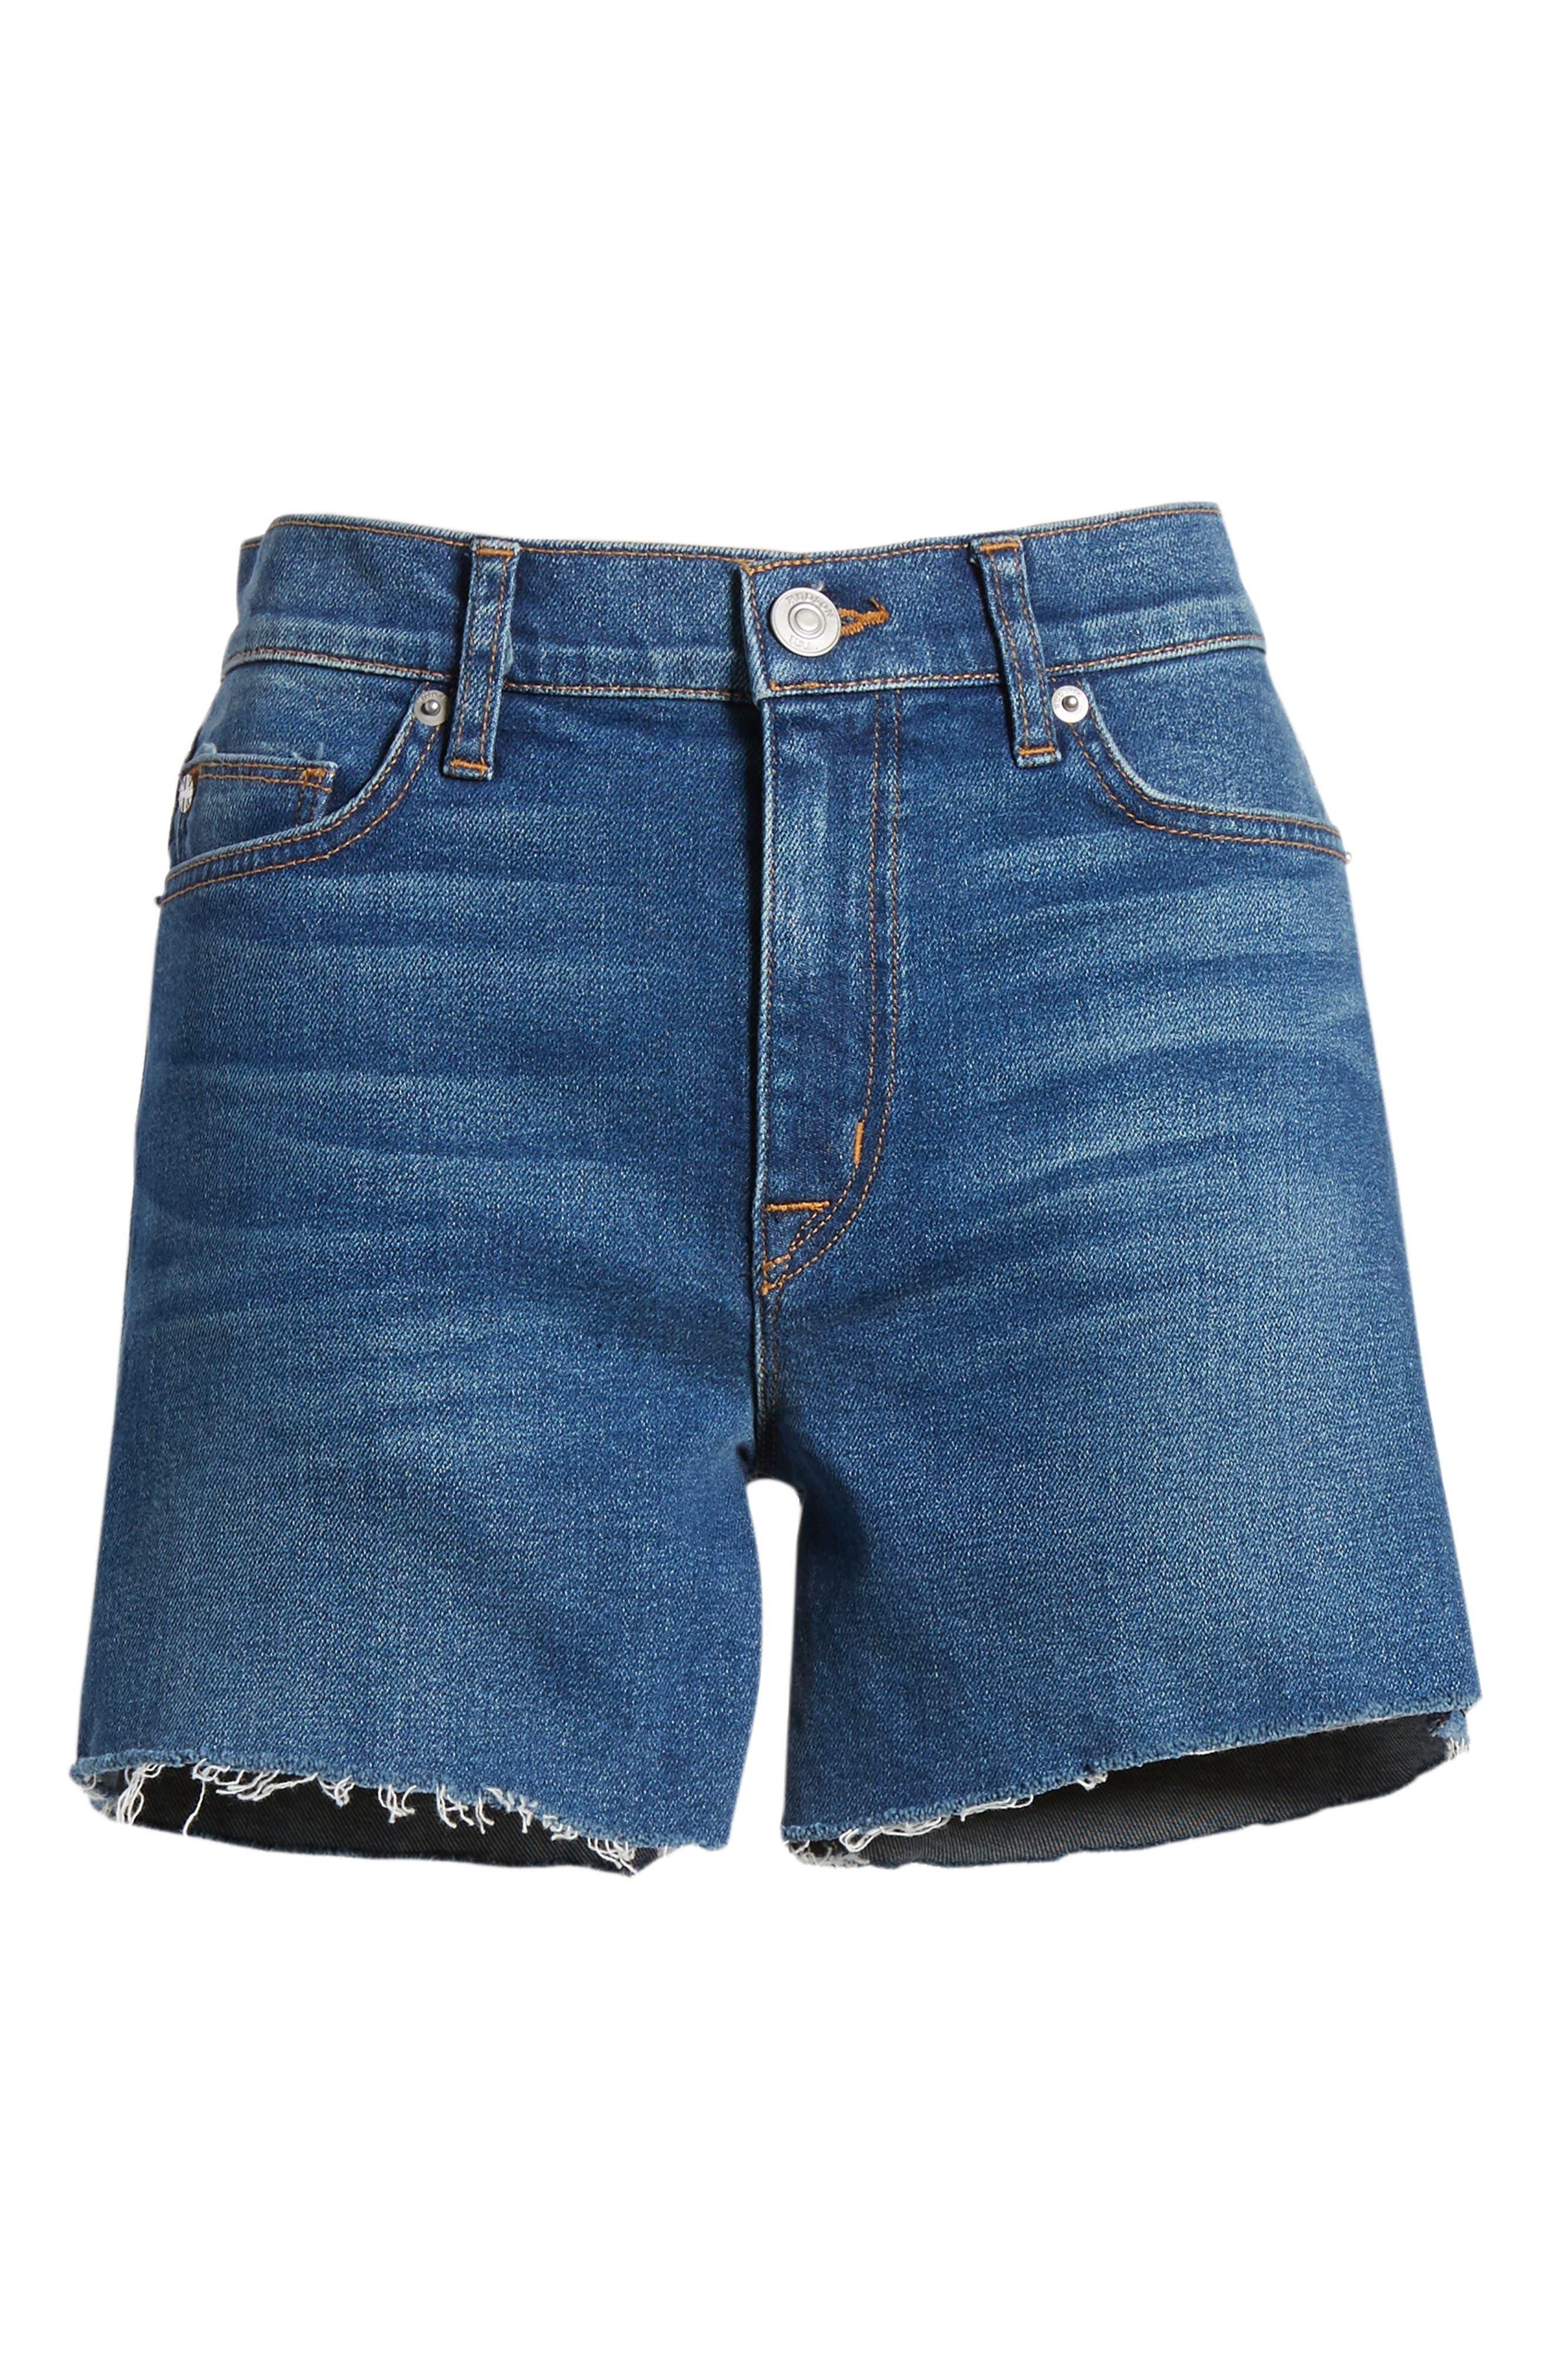 Valeri Cutoff Denim Shorts,                             Alternate thumbnail 7, color,